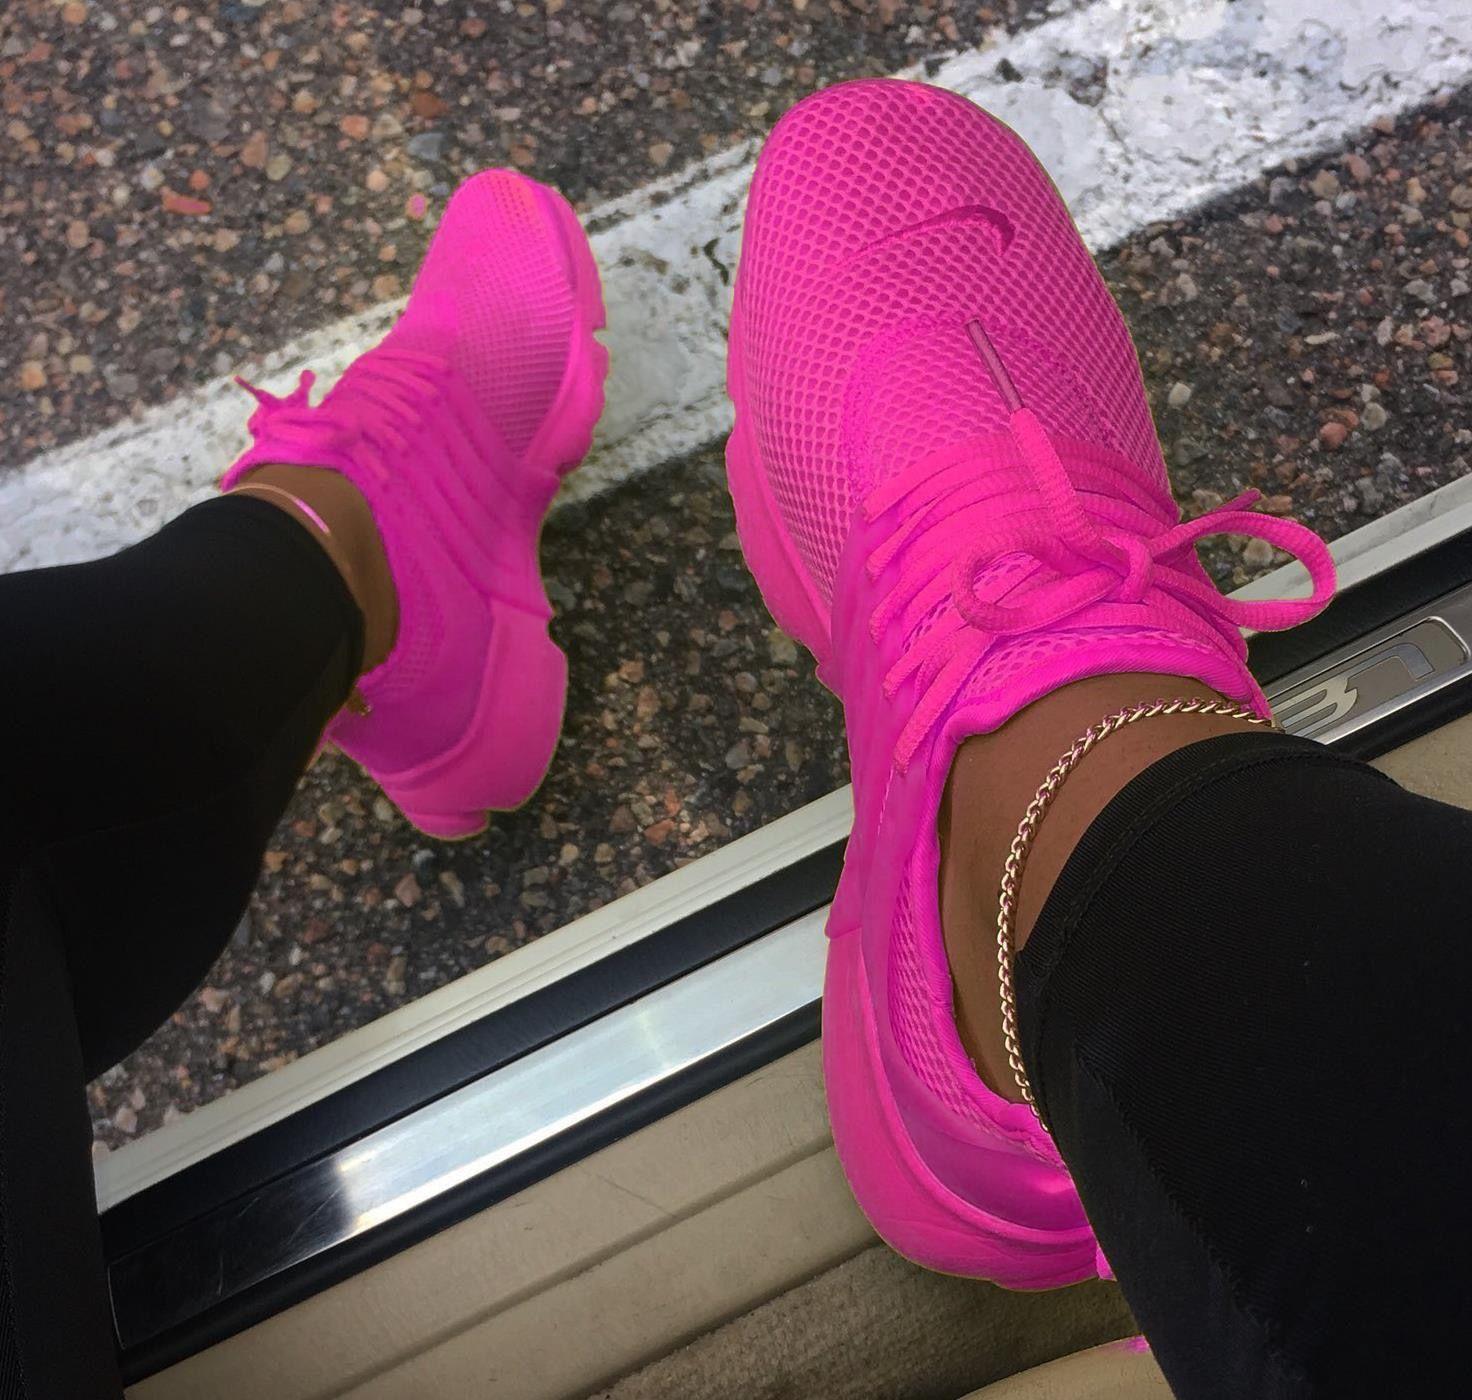 Pink sneakers, Sneakers, Sneakers fashion